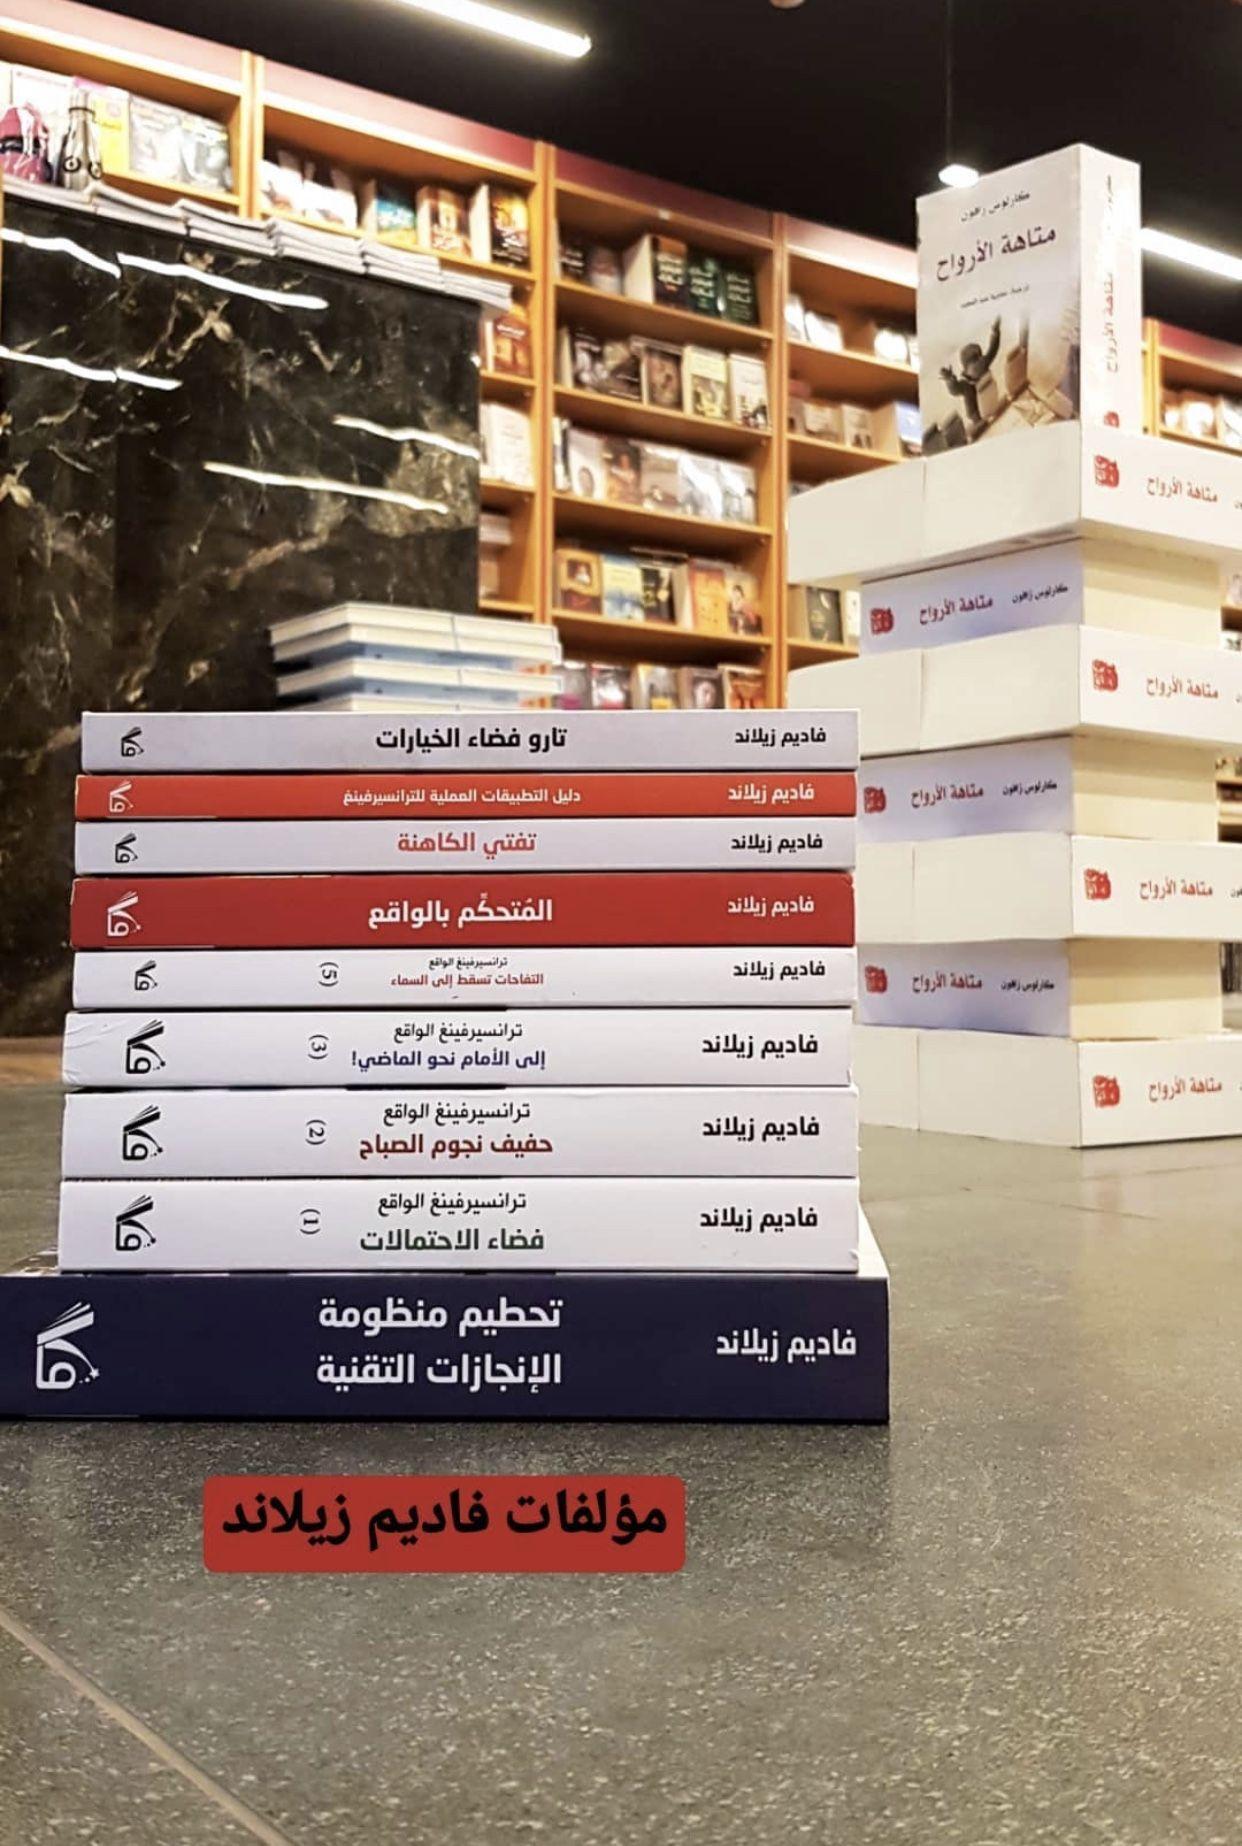 Pin By ياسر الخالدي On كتب Book Club Books Study Skills Books